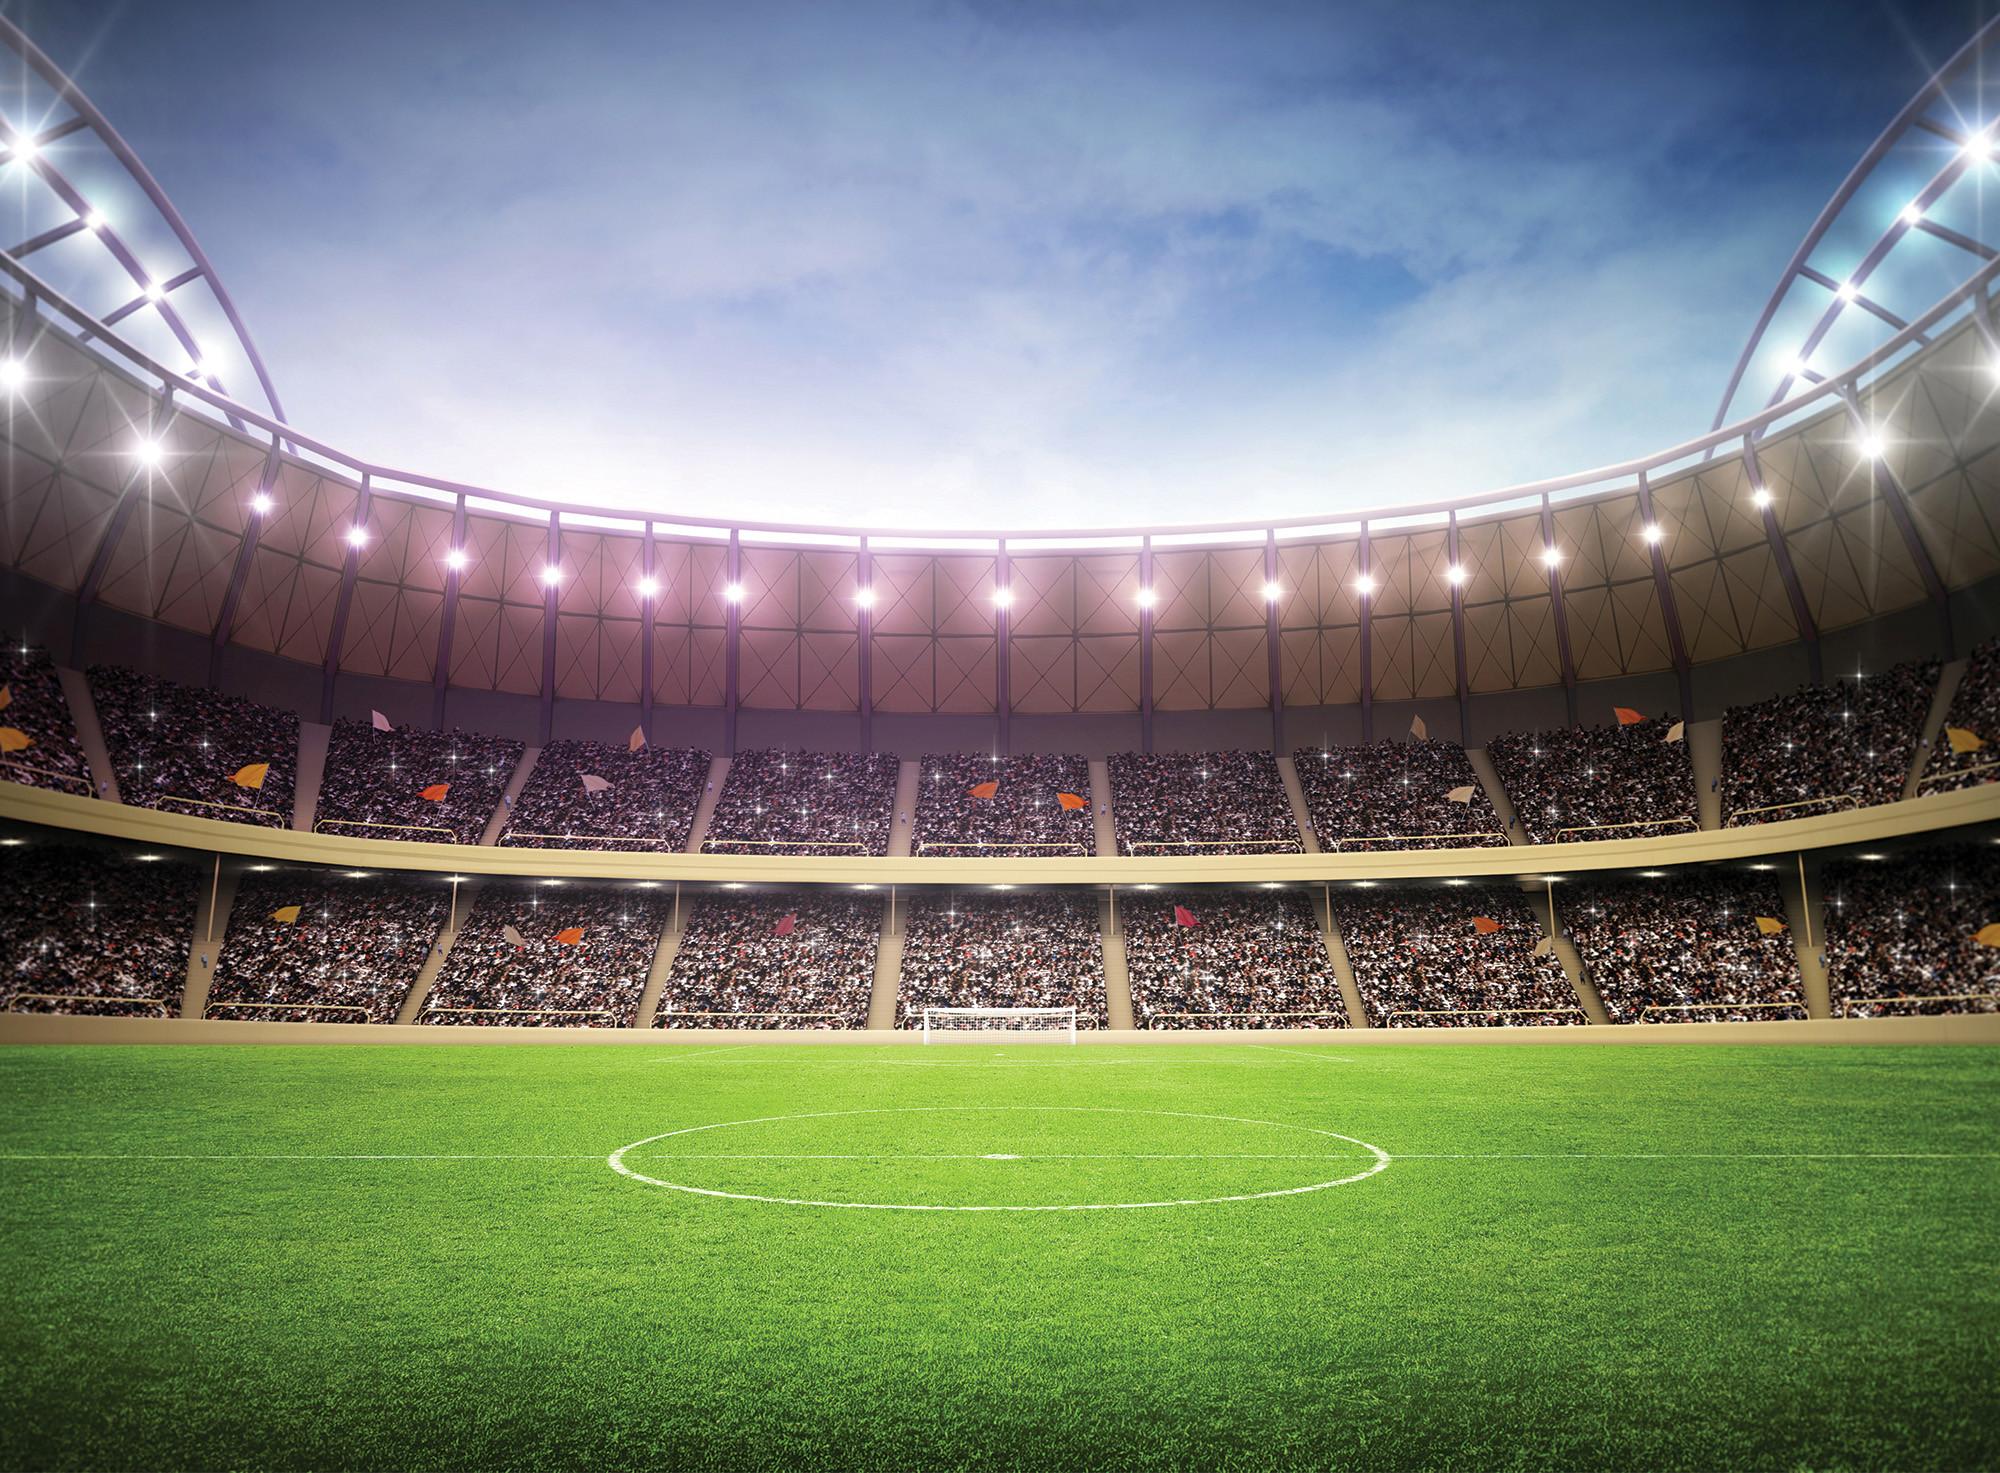 … football stadium mural